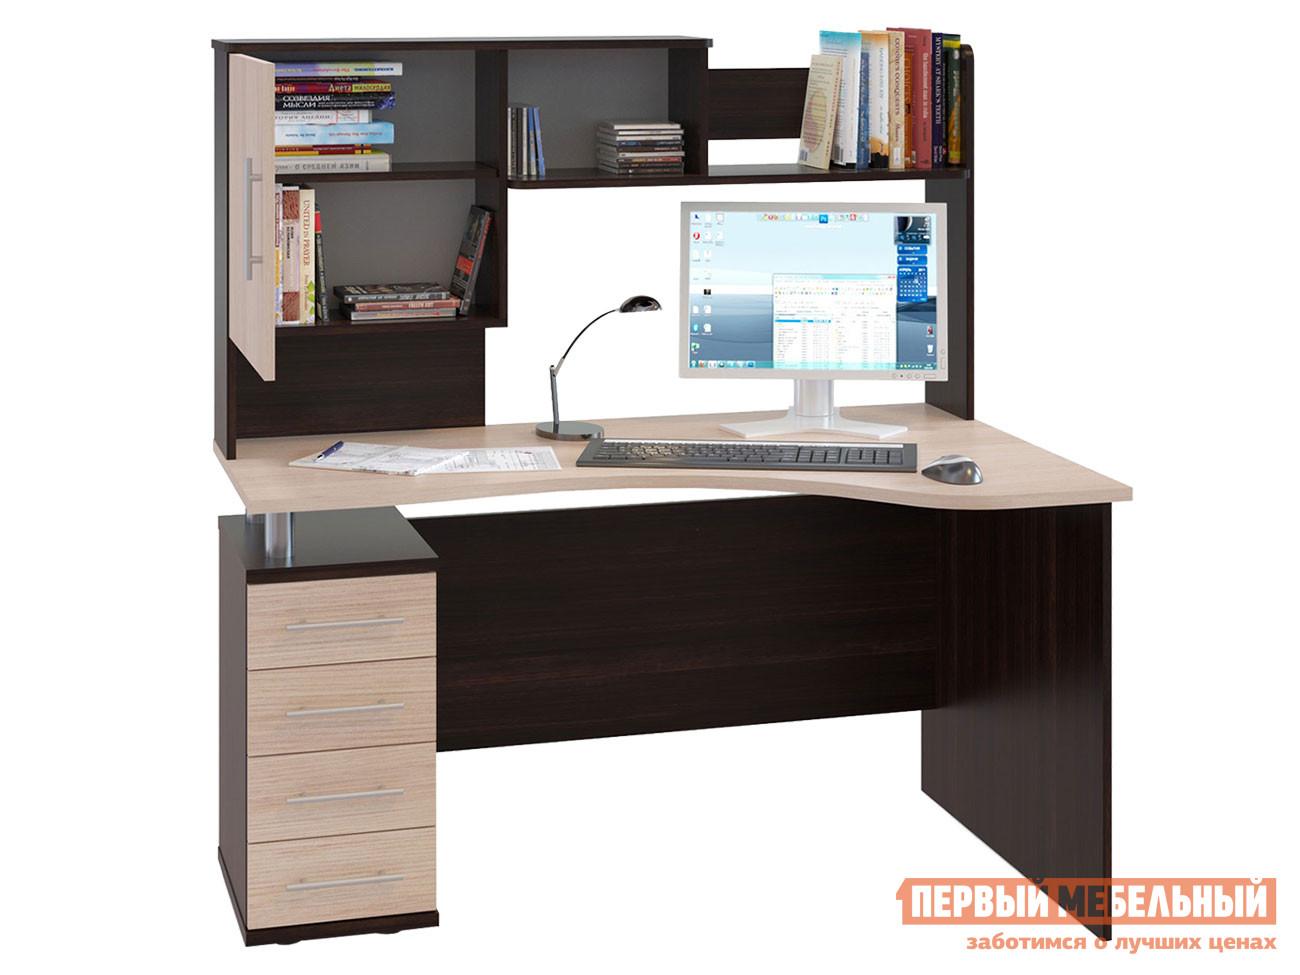 Компьютерный стол  КСТ-104.1 + КН-14 Корпус Венге / Фасад Беленый дуб, Левый Сокол 23247